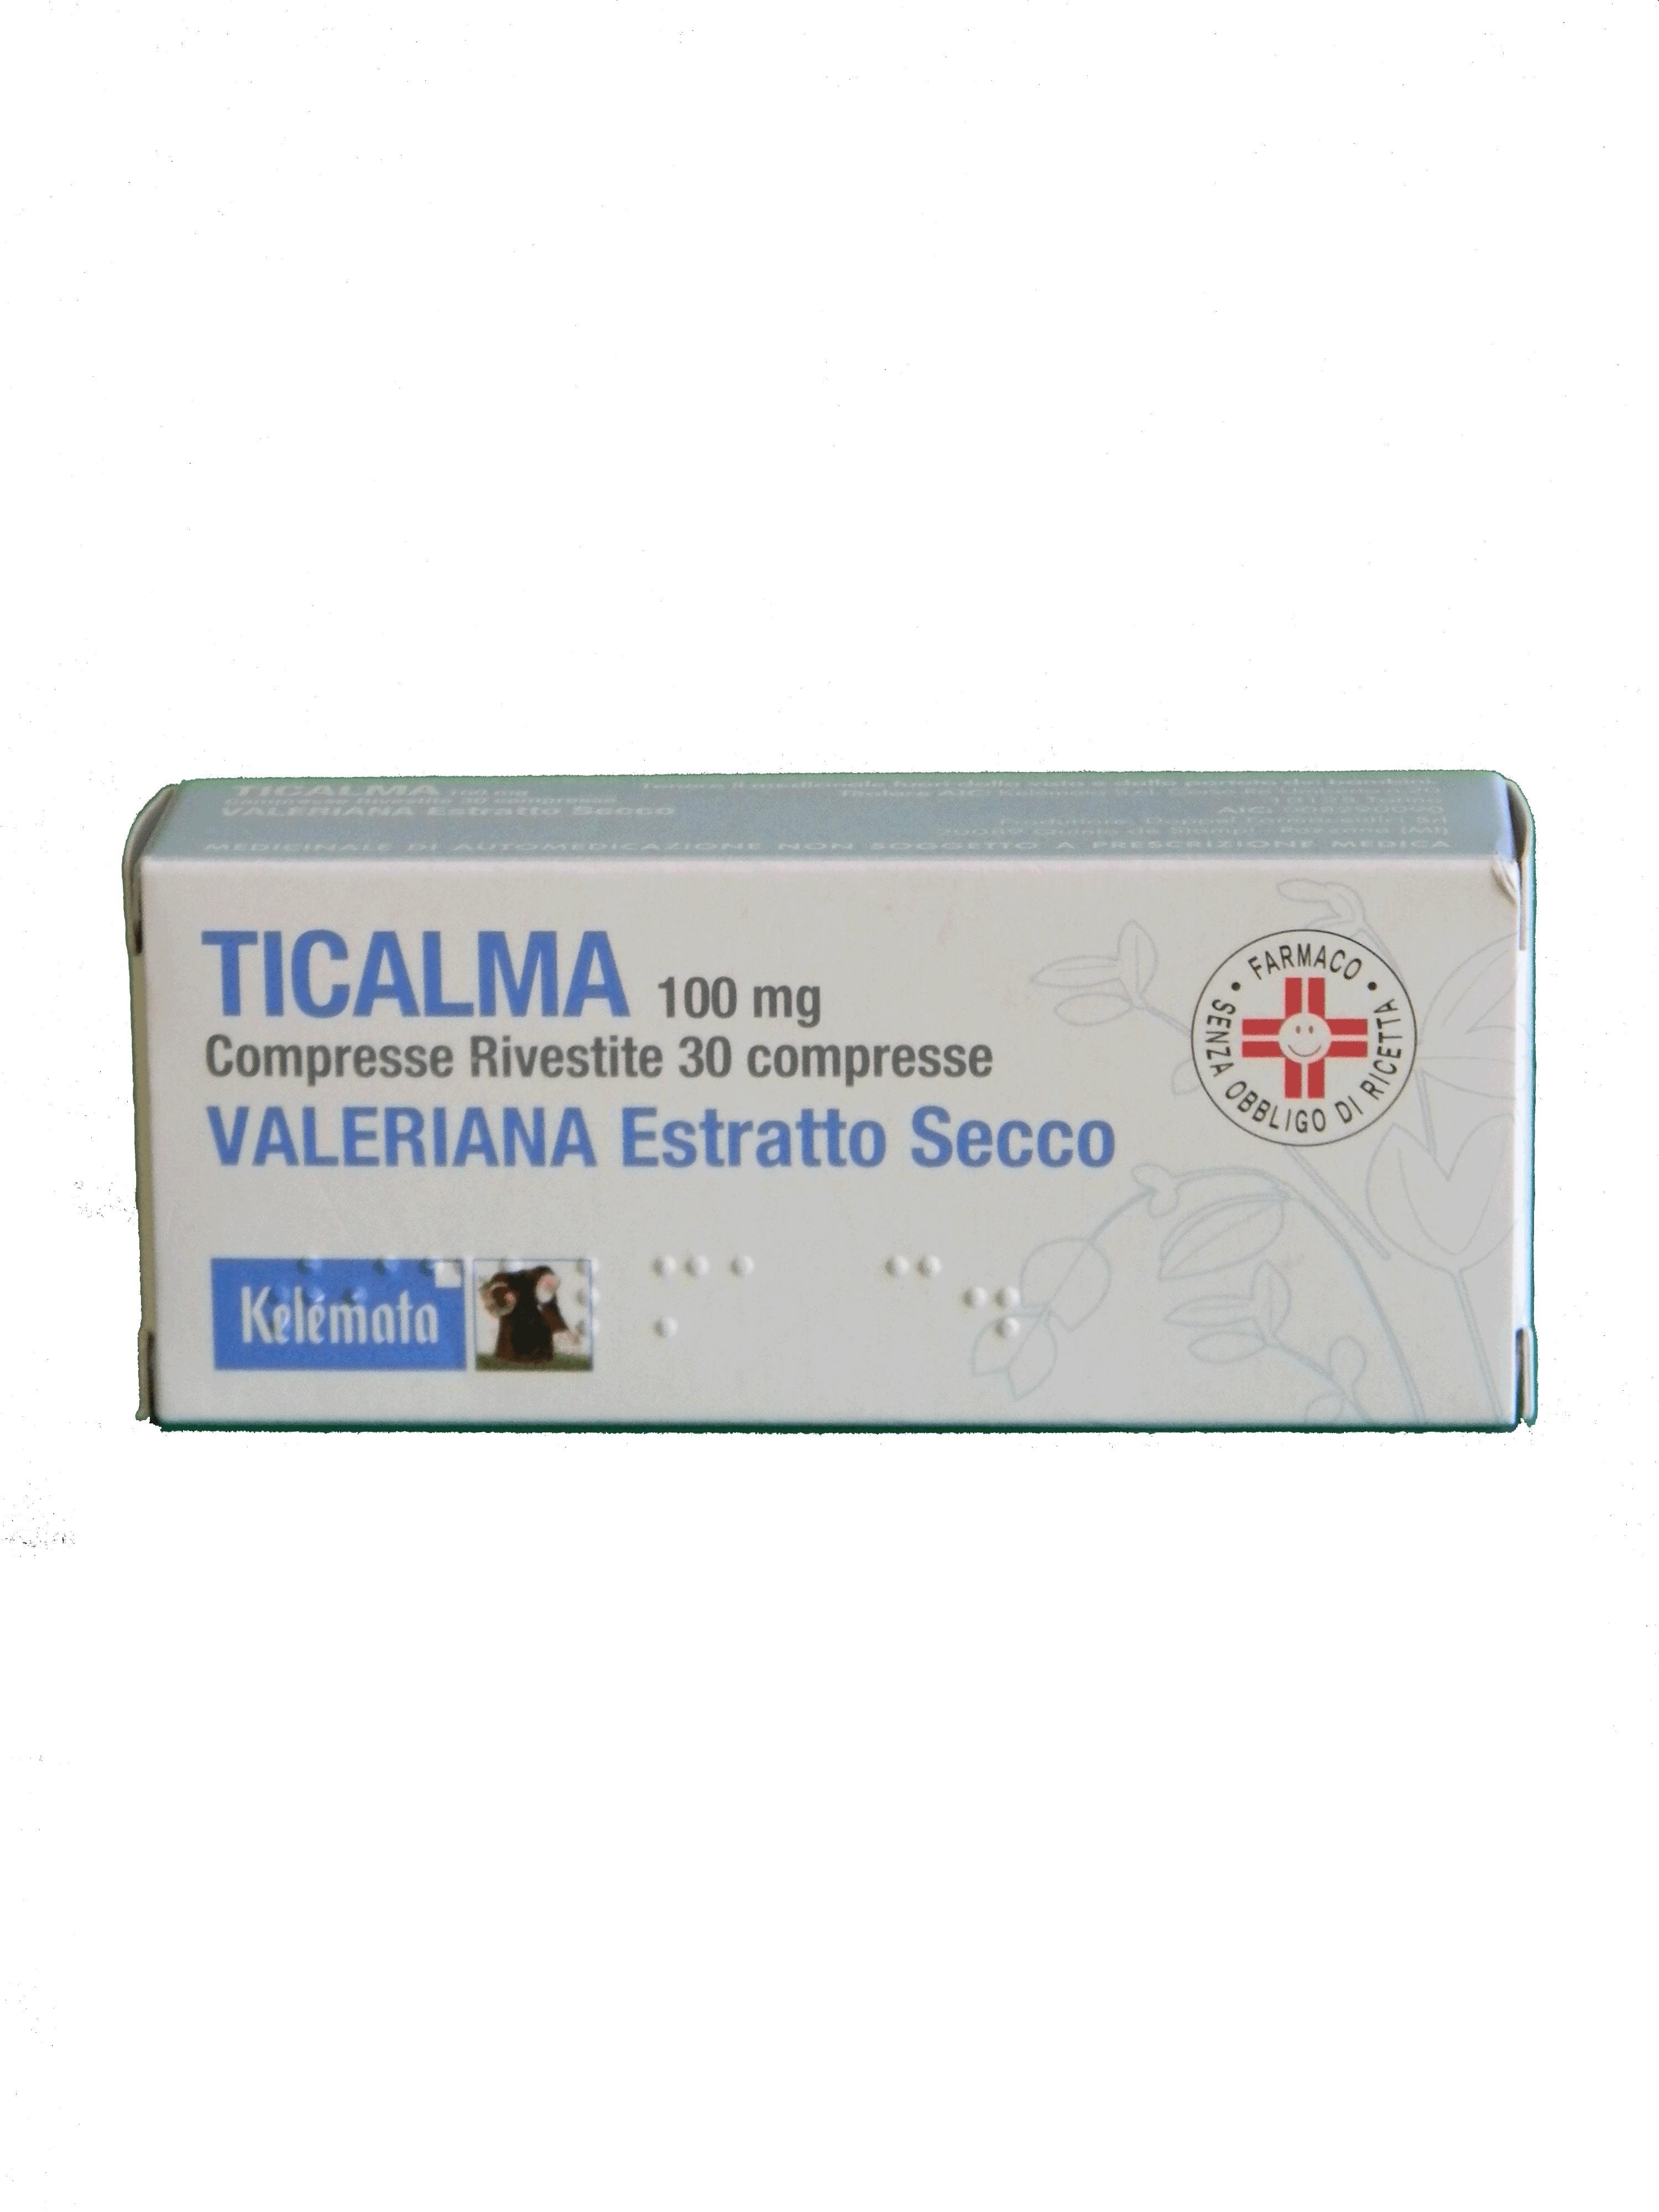 TICALMA*30CPR RIV 100MG - Farmacia 33